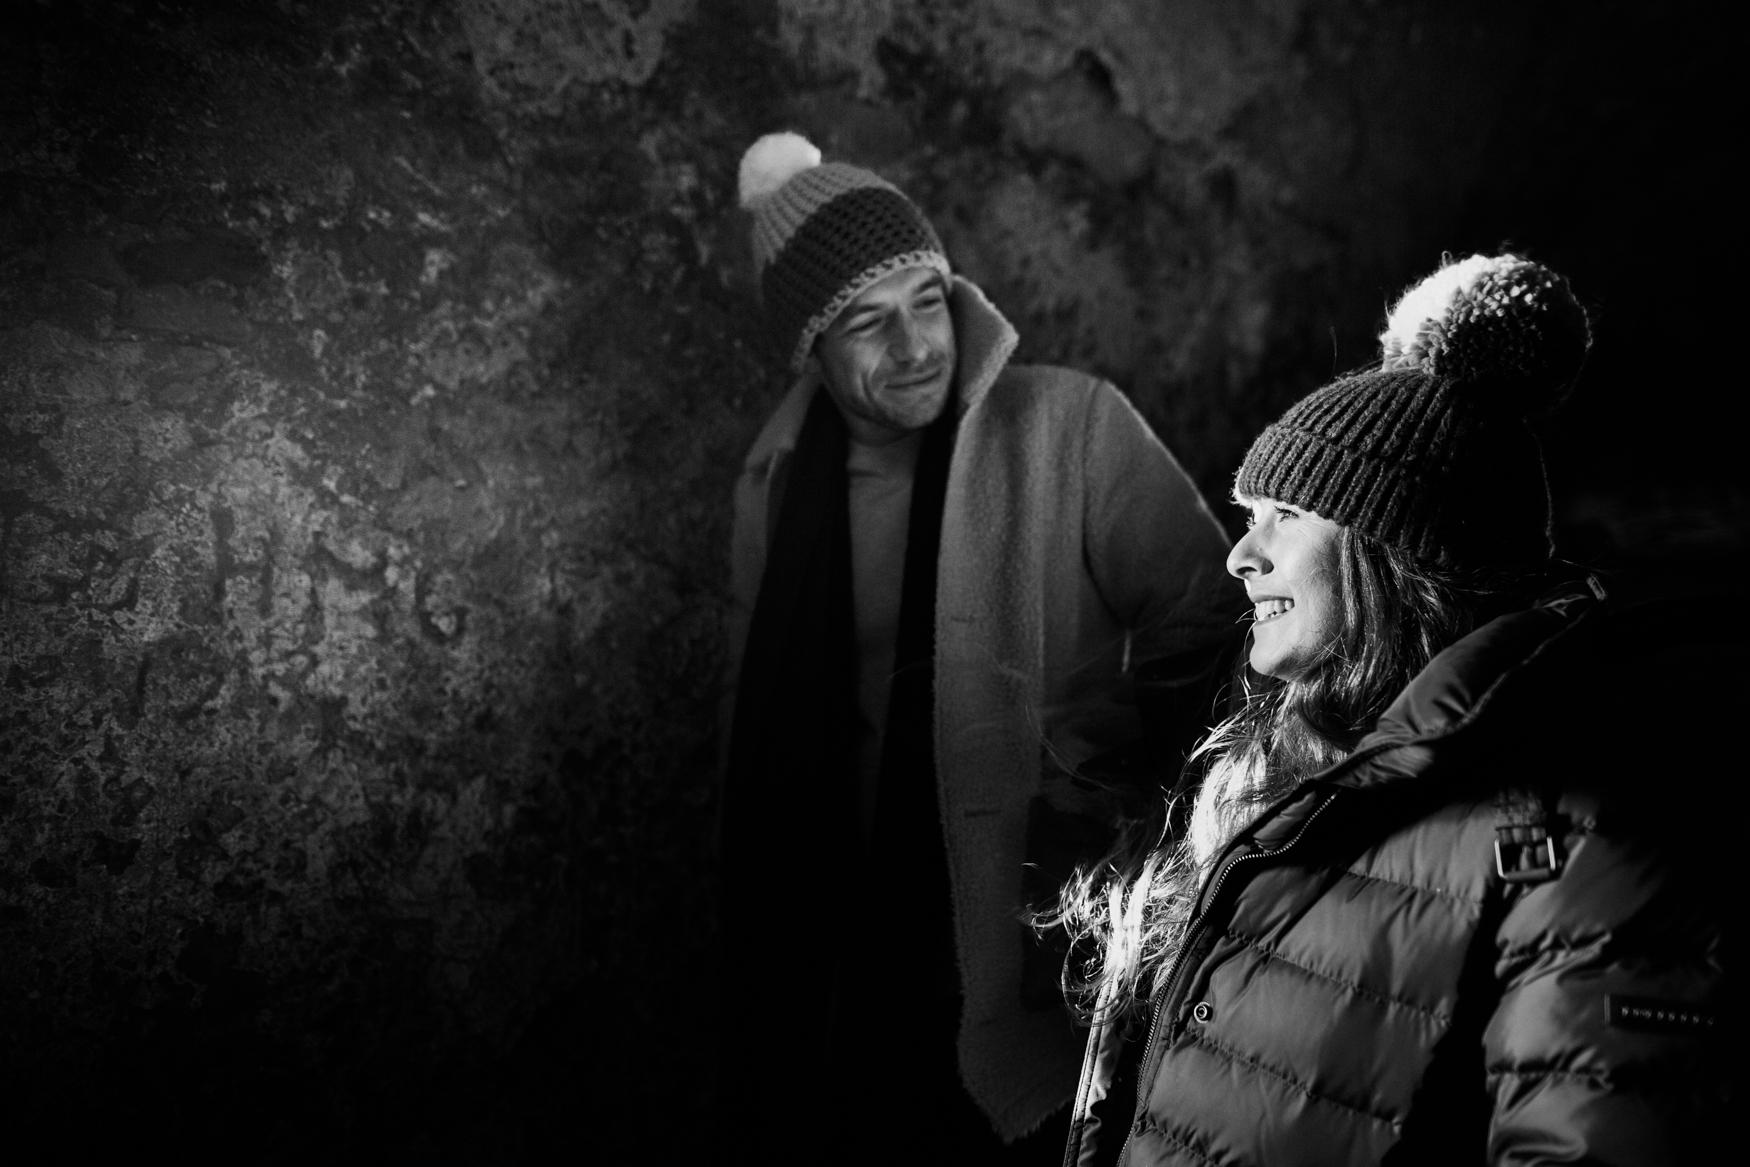 Alex-Sedgmond-Photography-Cardiff-Prewedding-Photography-Castlemartin-Pembrokeshire-WestWales-8.JPG